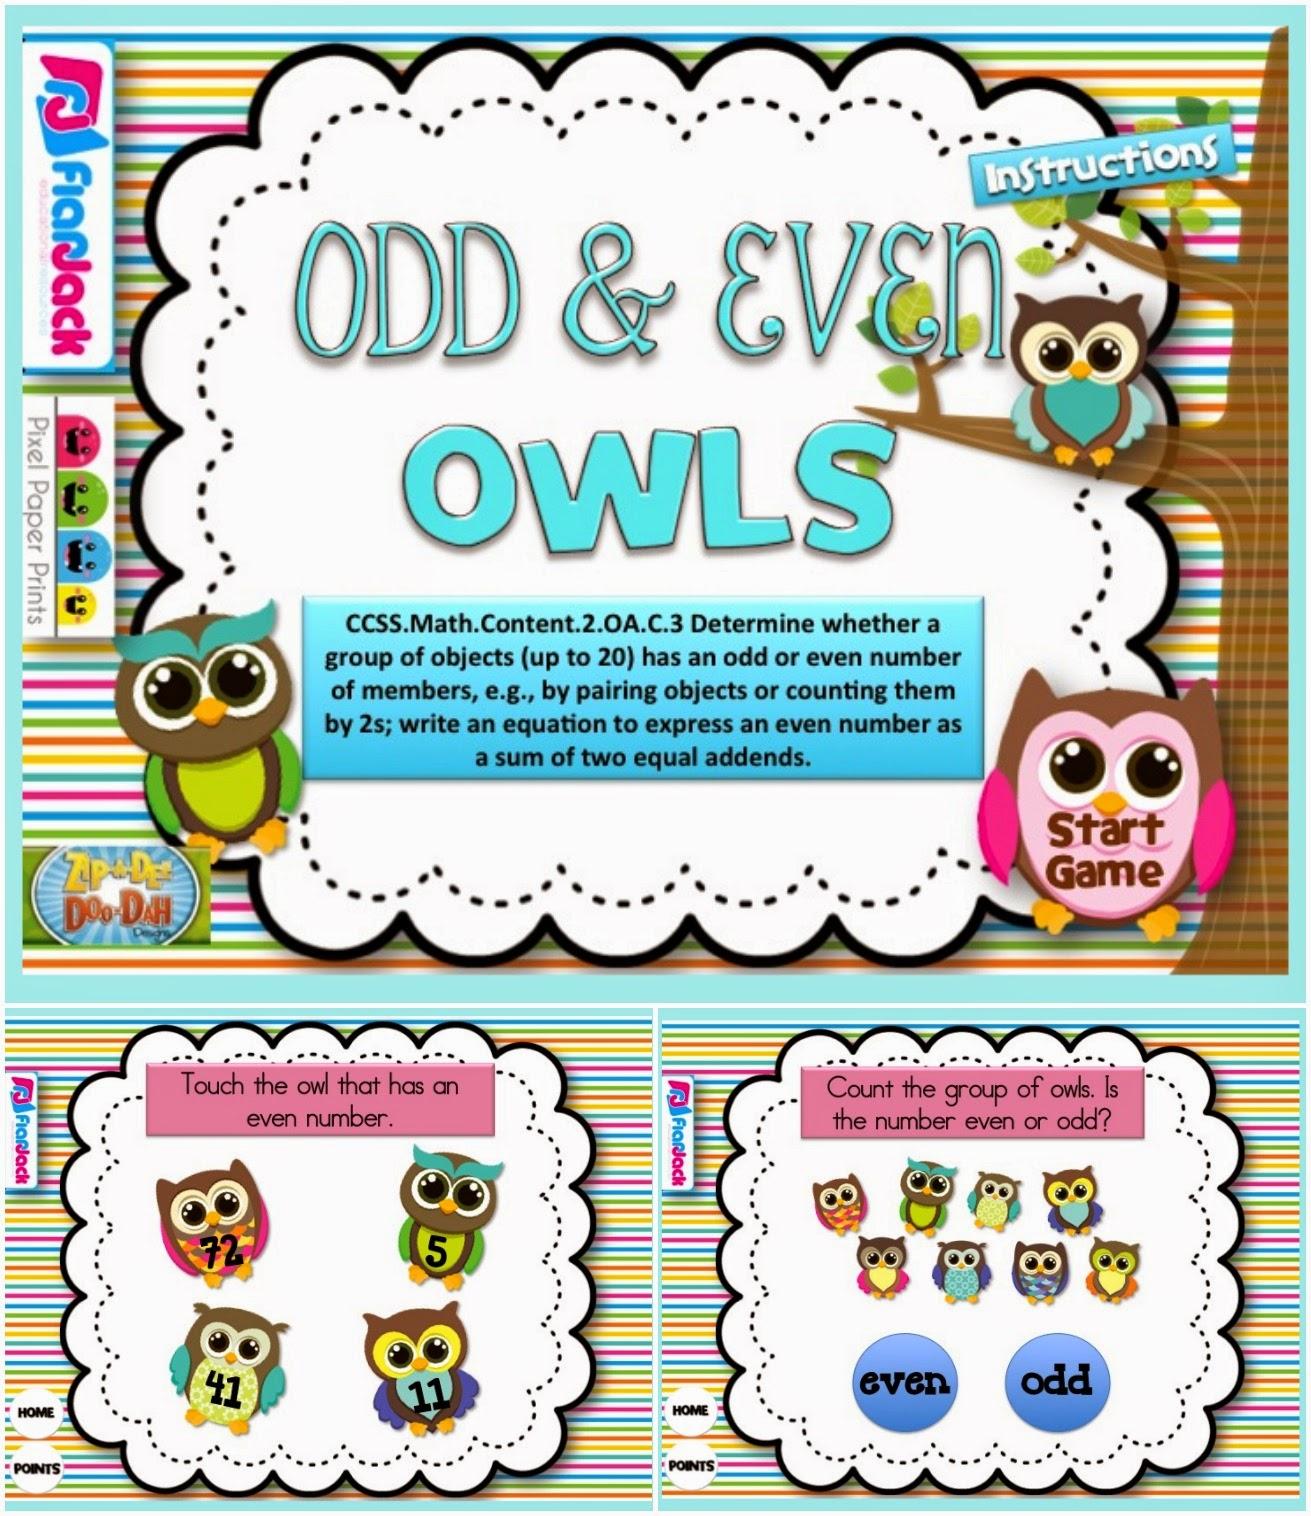 http://www.teacherspayteachers.com/Product/Odd-and-Even-Owls-Smart-Board-Game-CCSS2OAC3-1232817